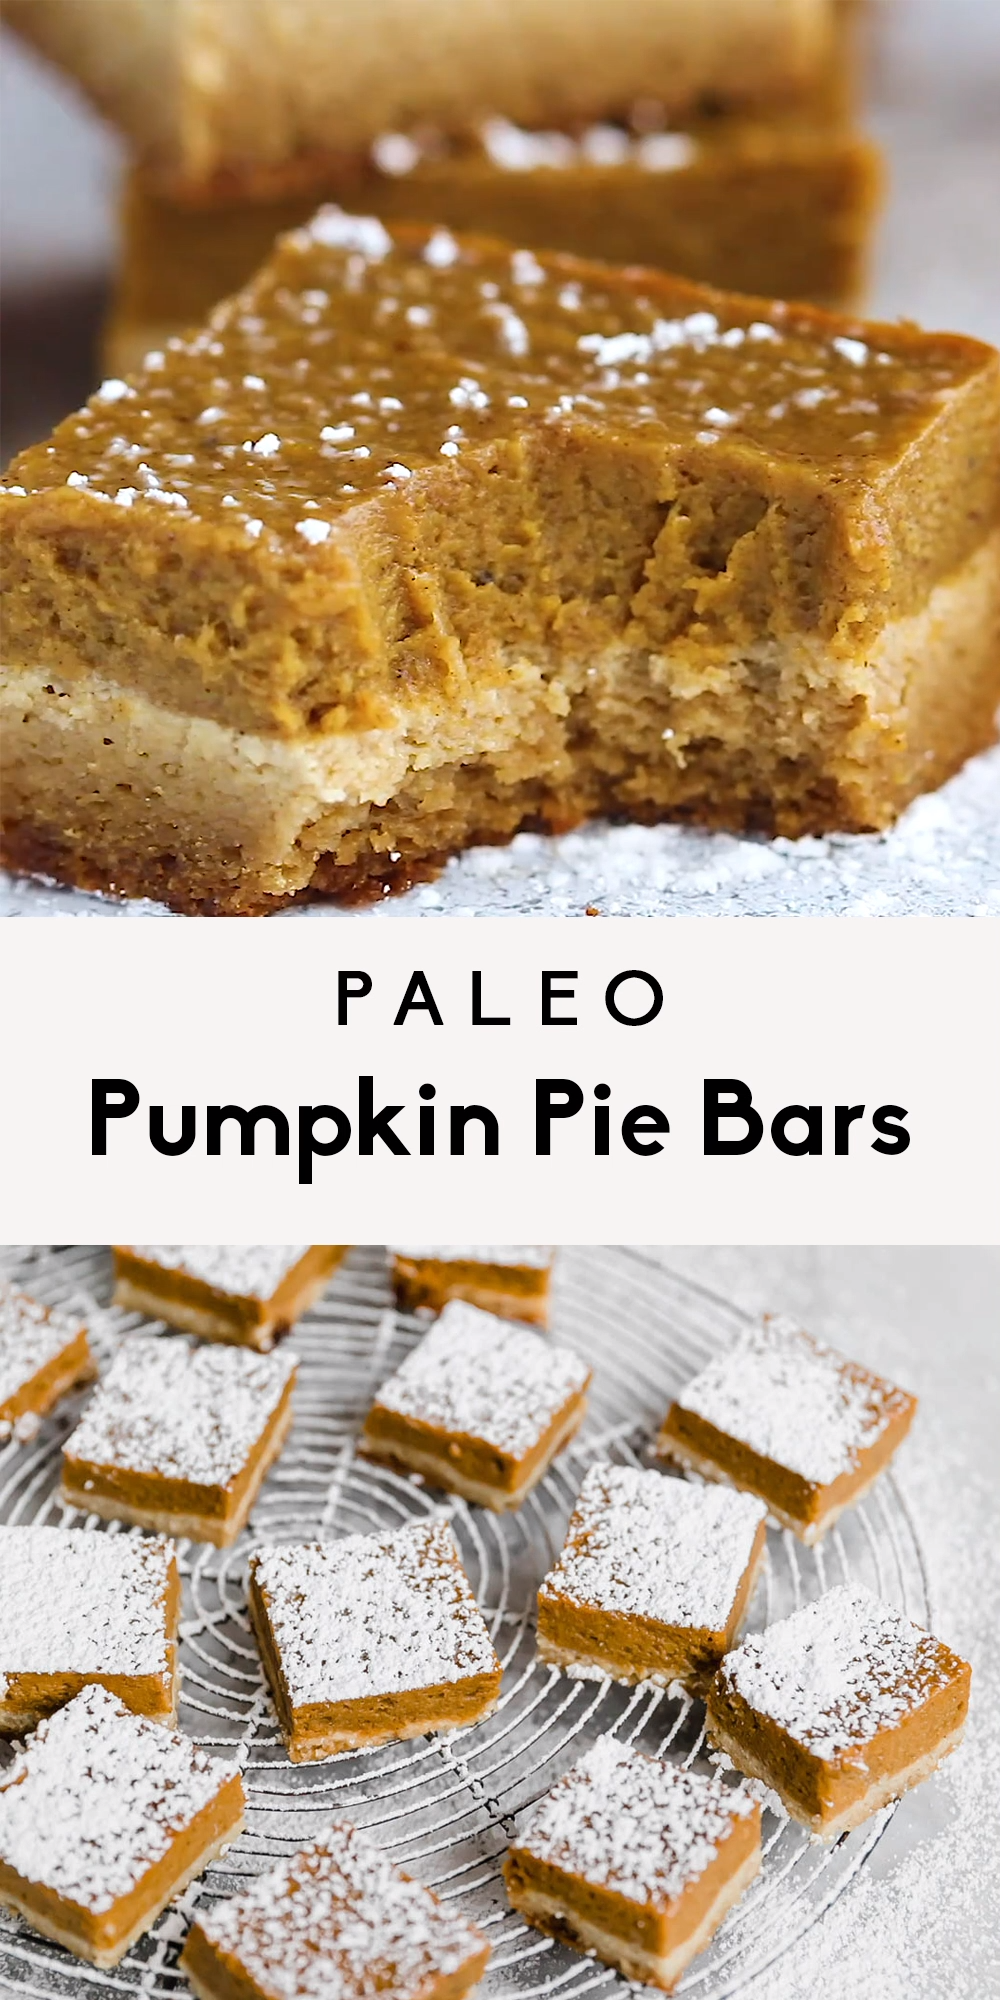 Photo of Paleo Pumpkin Pie Bars with Almond Flour Sugar Cookie Crust